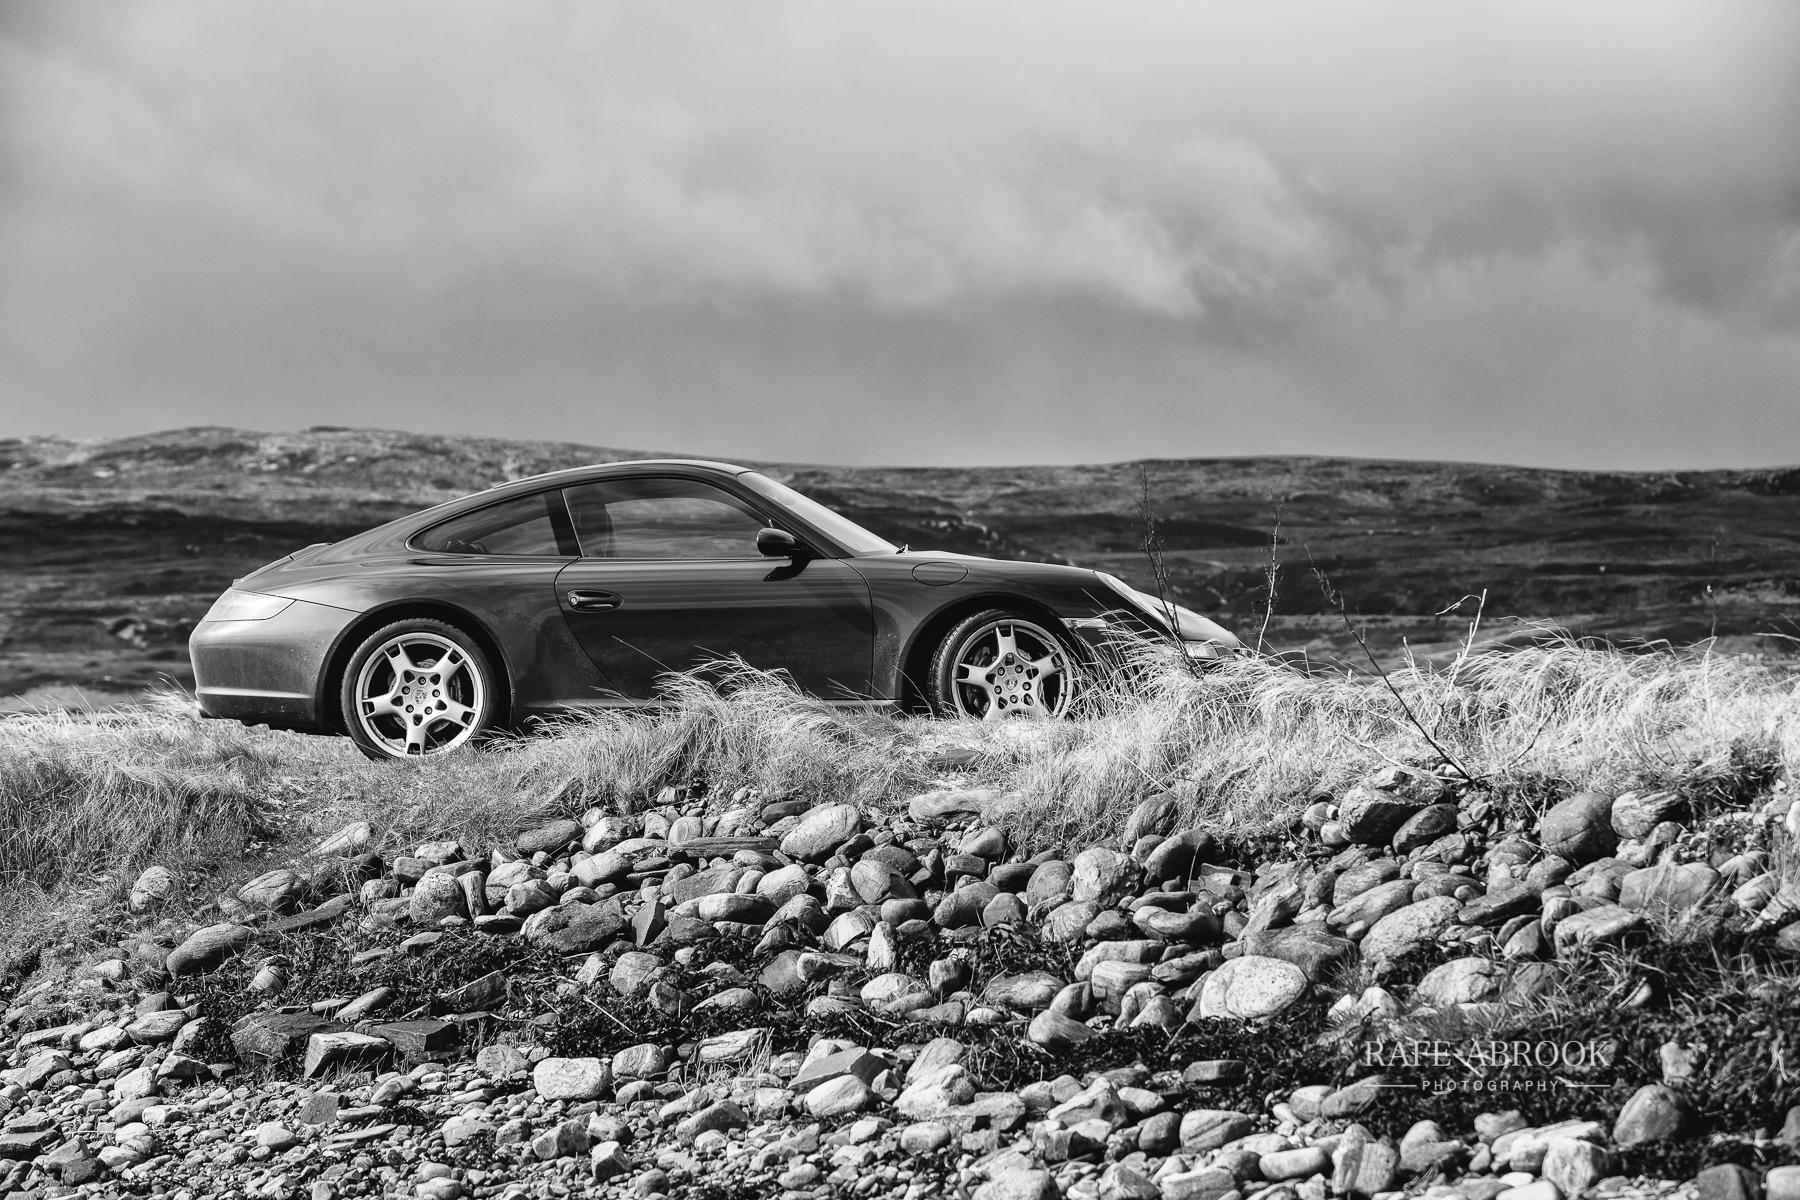 north coast 500 scotland porsche cayman gt4 golf r estate rafe abrook photography-1194.jpg